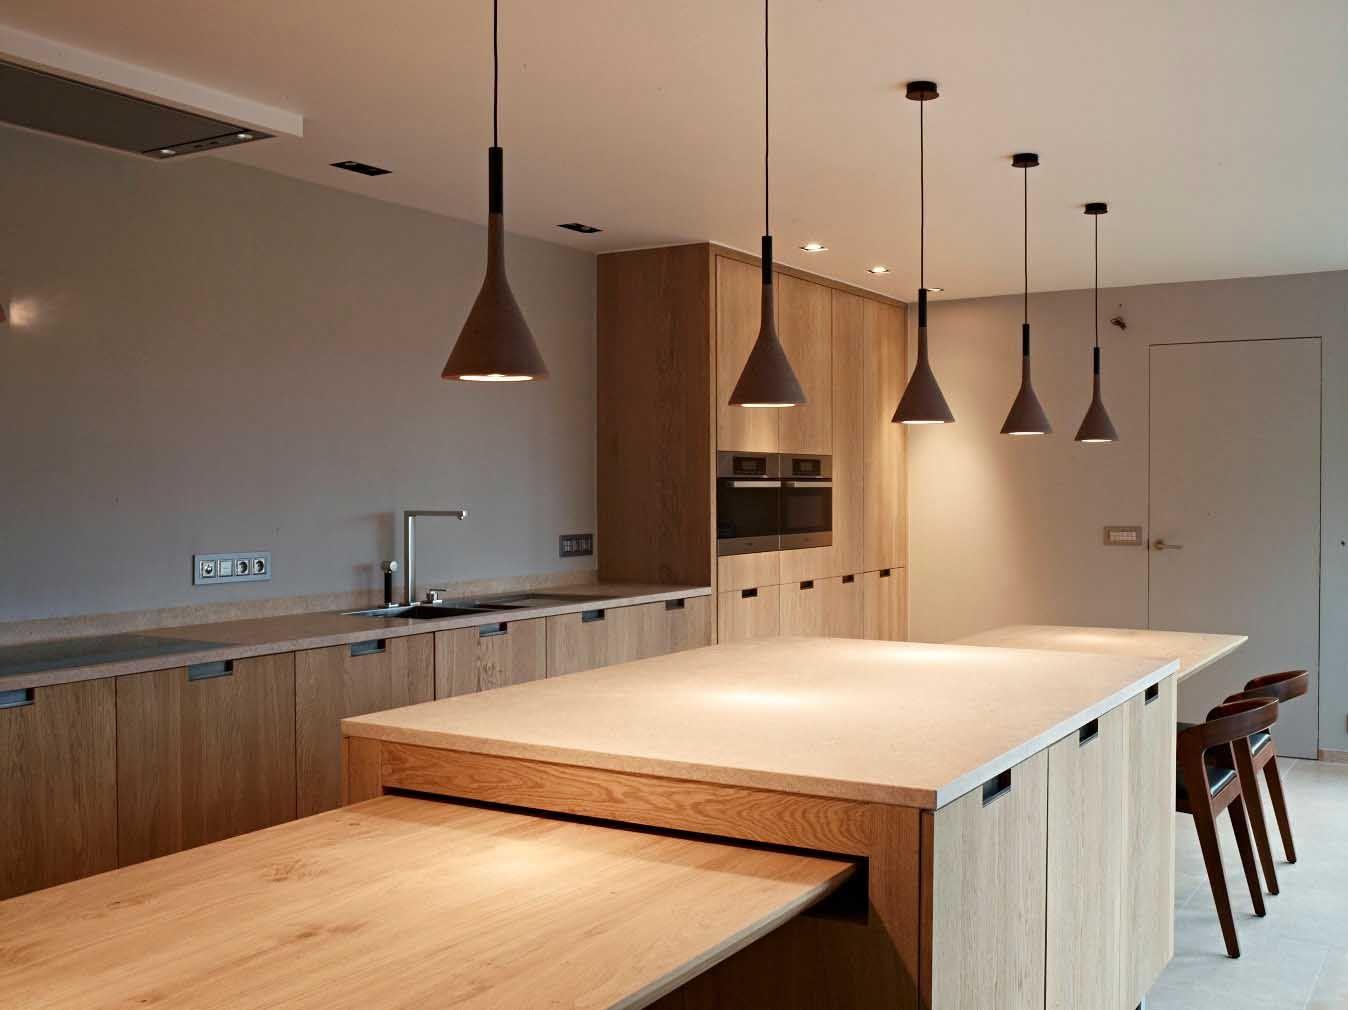 Keuken Interieur Scandinavisch : Eiken keuken tijdloos met eiland donal louis house in